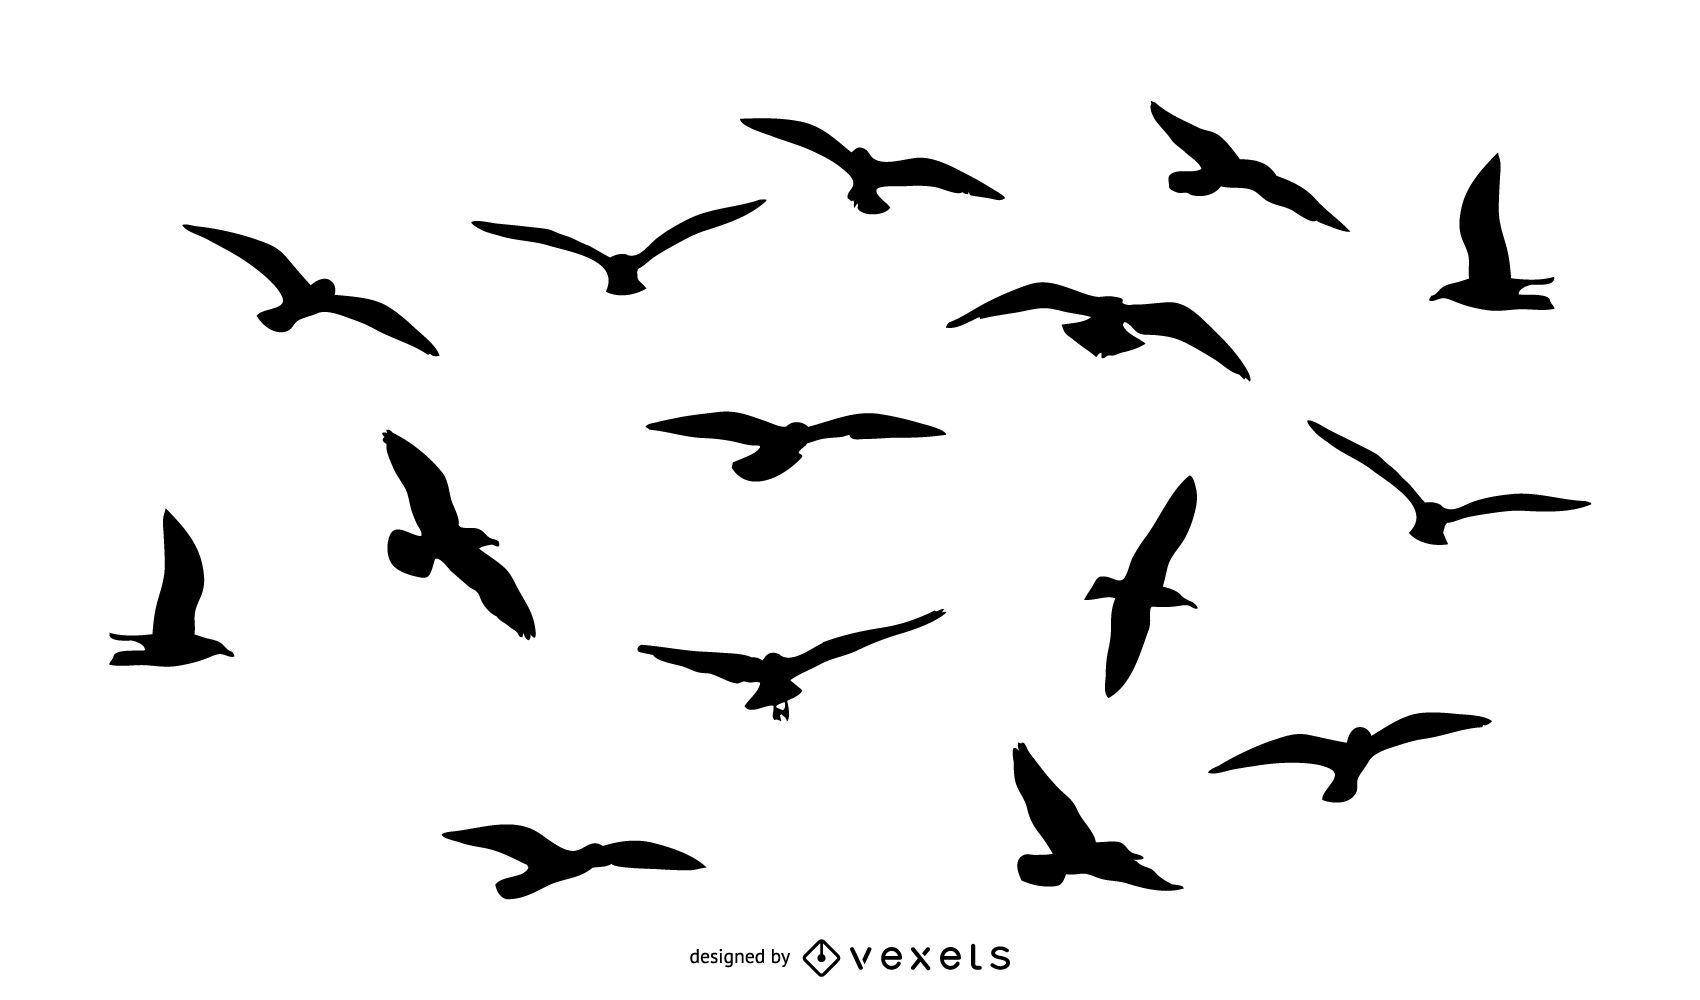 Pack de silueta de pájaros volando